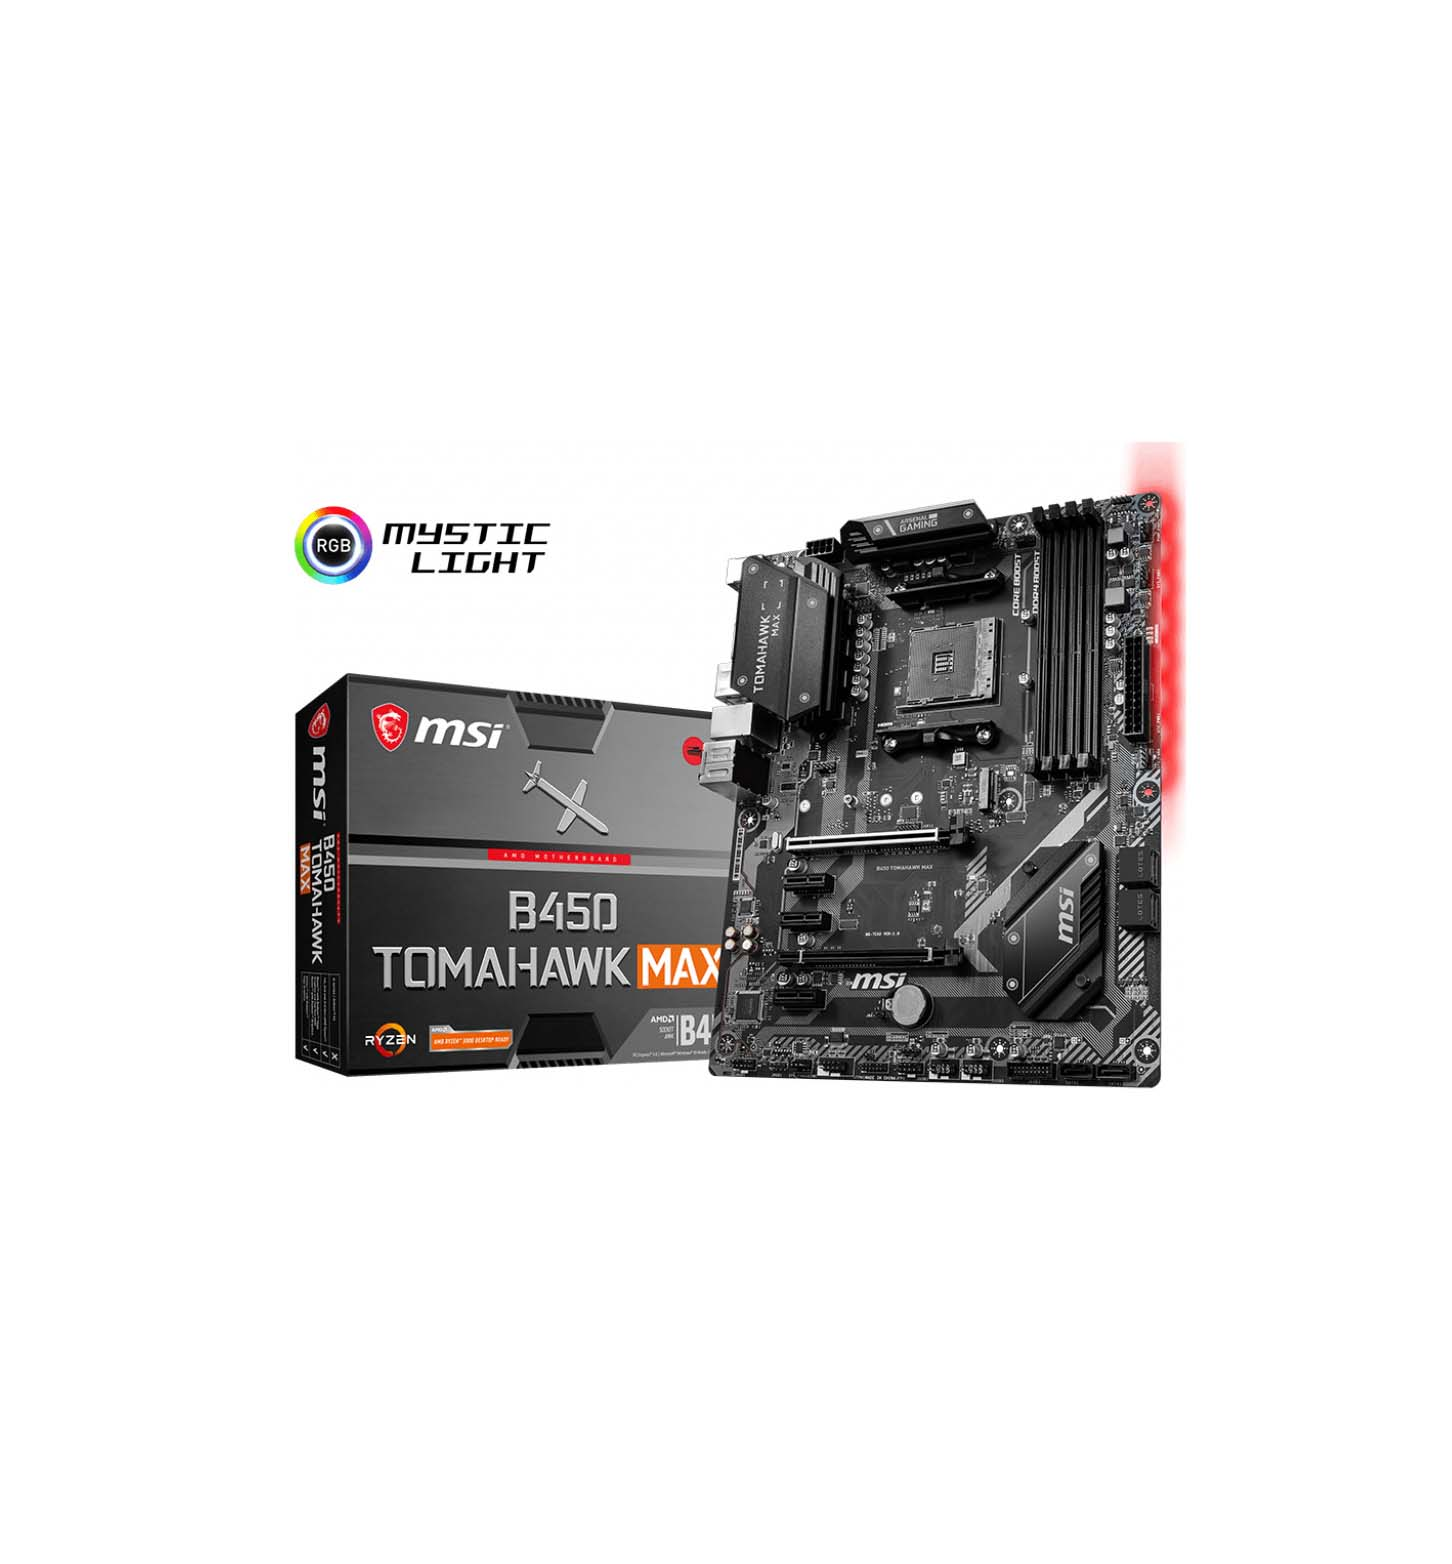 MSI B450 Tomahawk Max 7C02-020R Μητρική Κάρτα